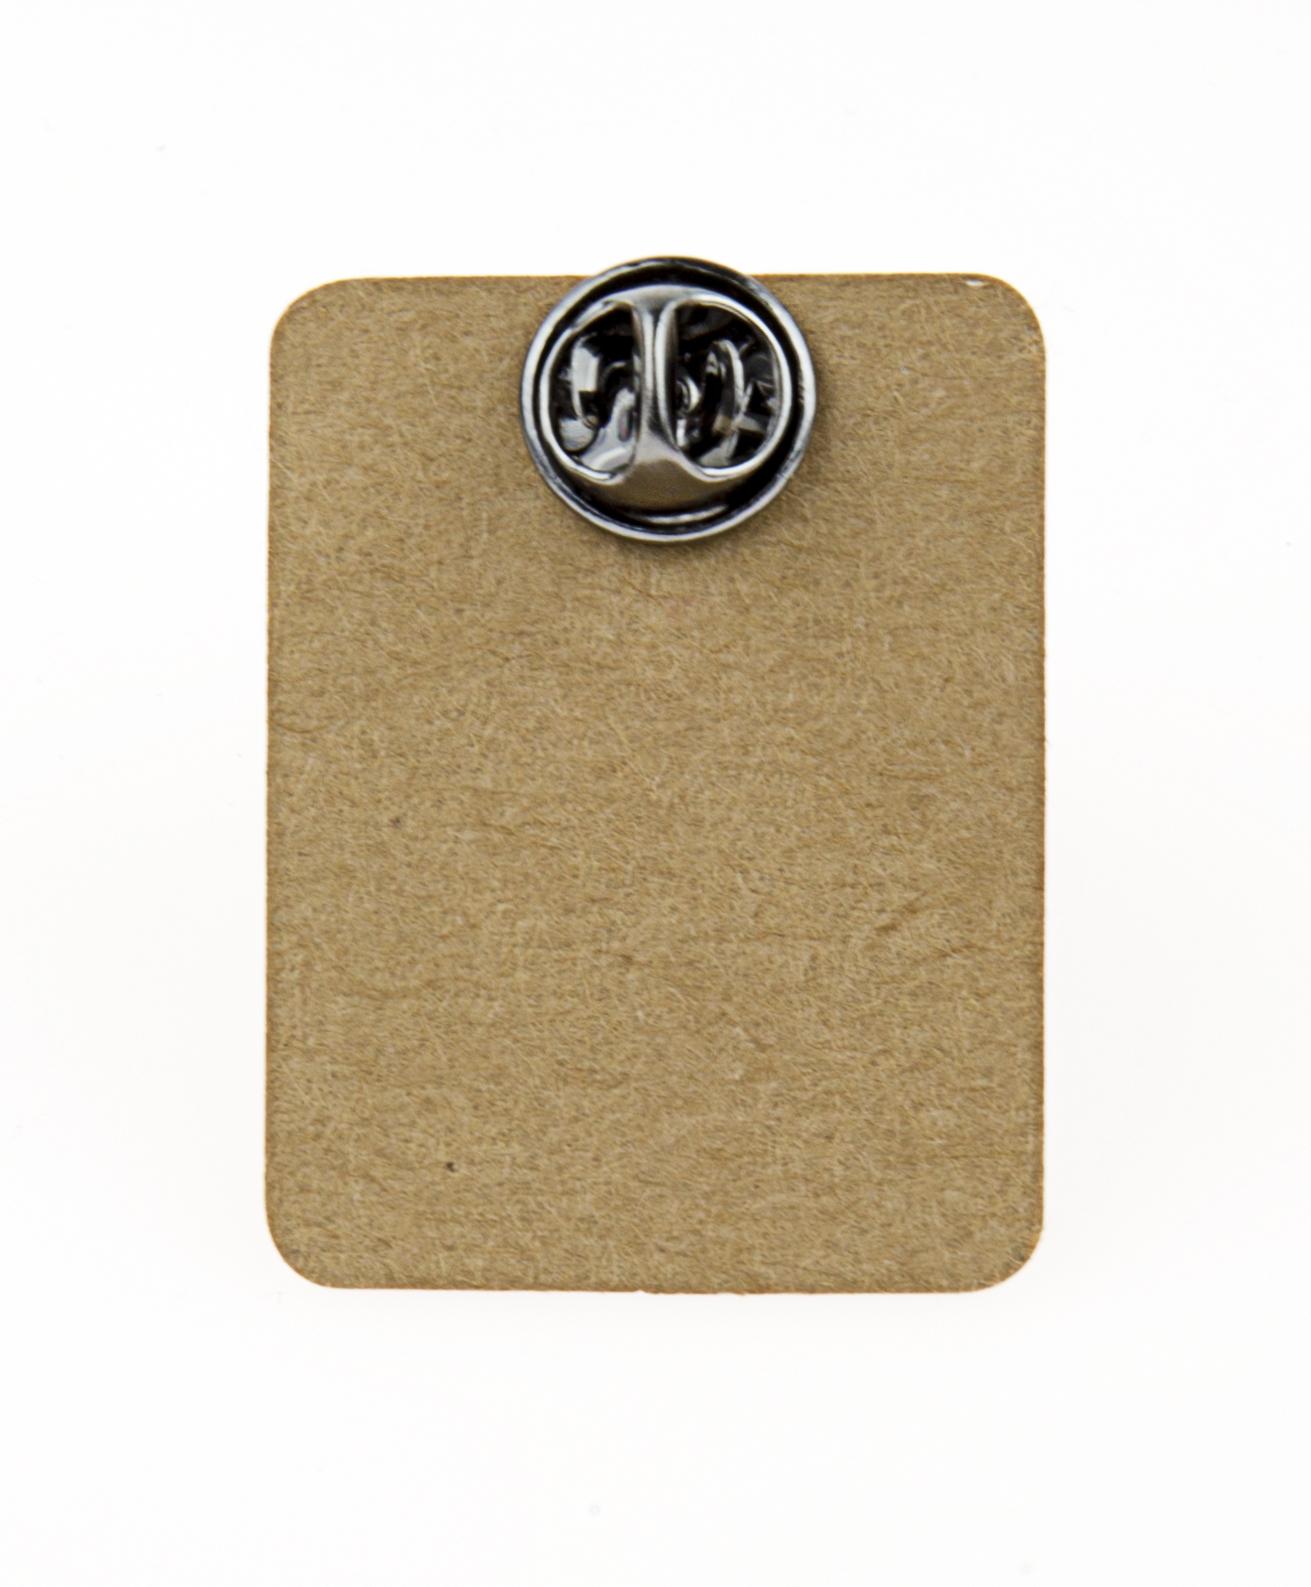 Metal Palette Paint Enamel Pin Badge